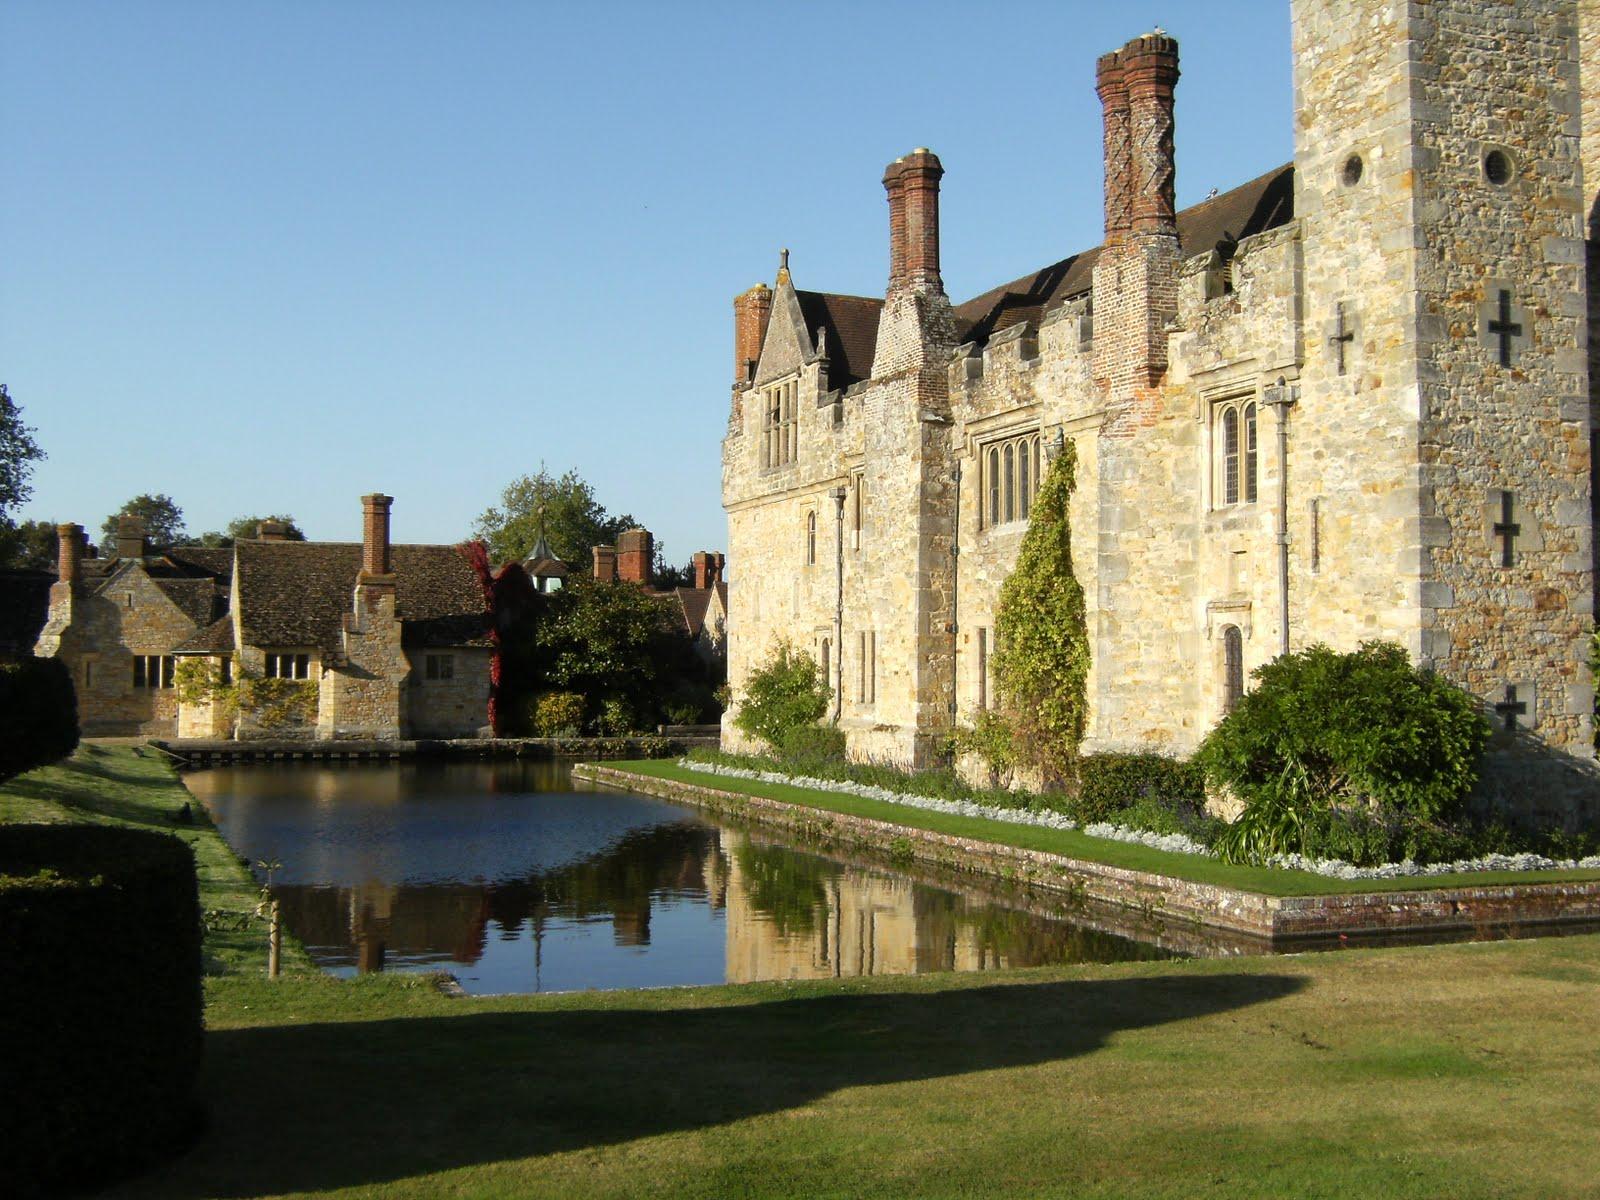 DSCF1997 Hever Castle and Tudor-style village